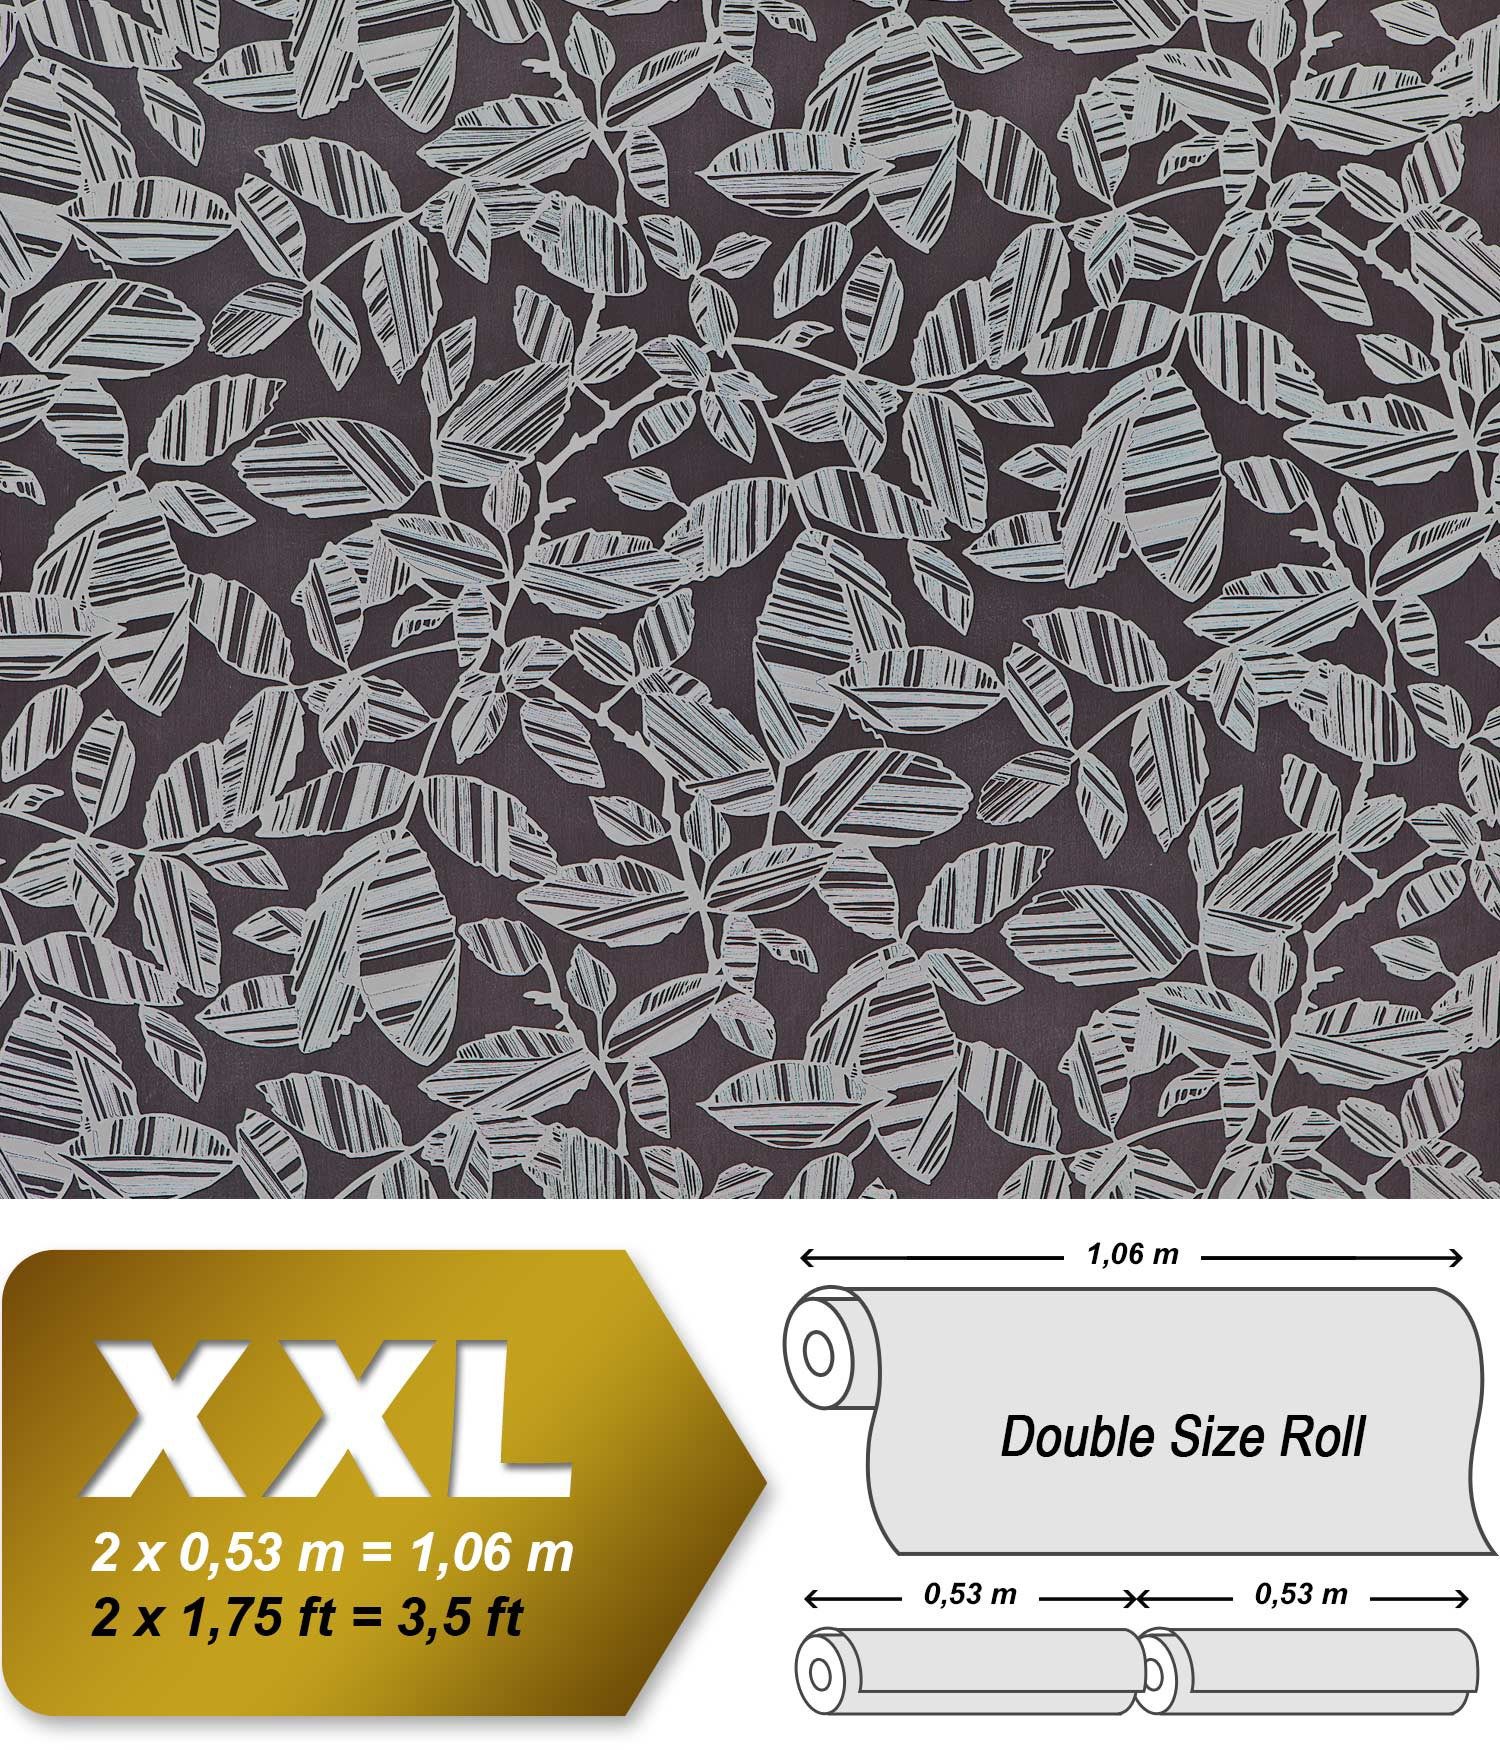 blumen tapete xxl vliestapete edem 923 39 elegantes florales design muster metallic effekt grau schwarz - Vliestapete Muster